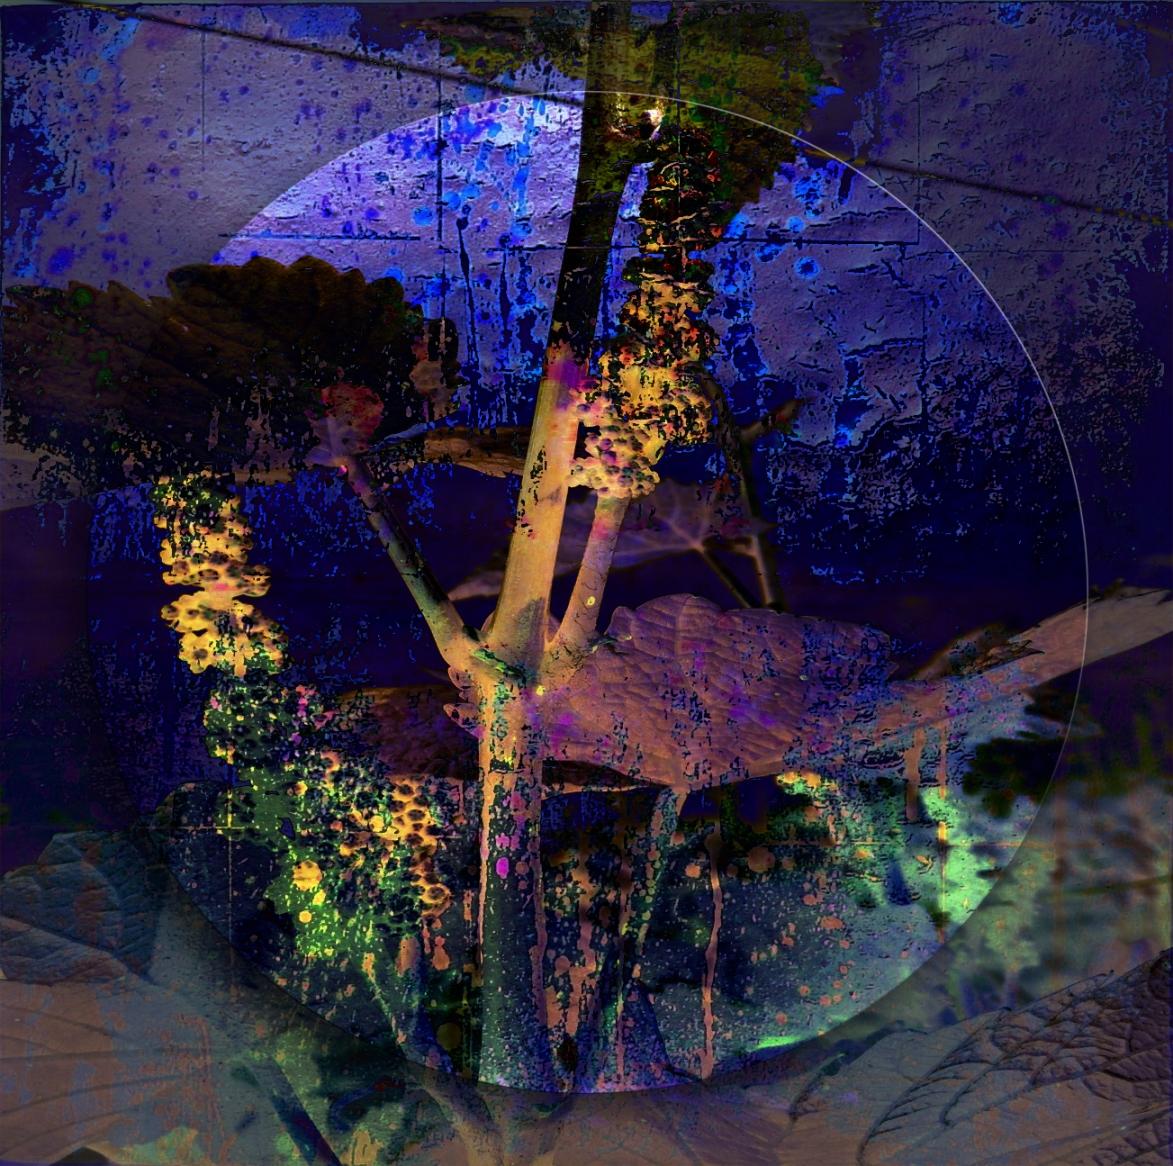 12-08 Mixed Media Blattgold Einwand 40 x 40 cm-Rebe_Mond-1